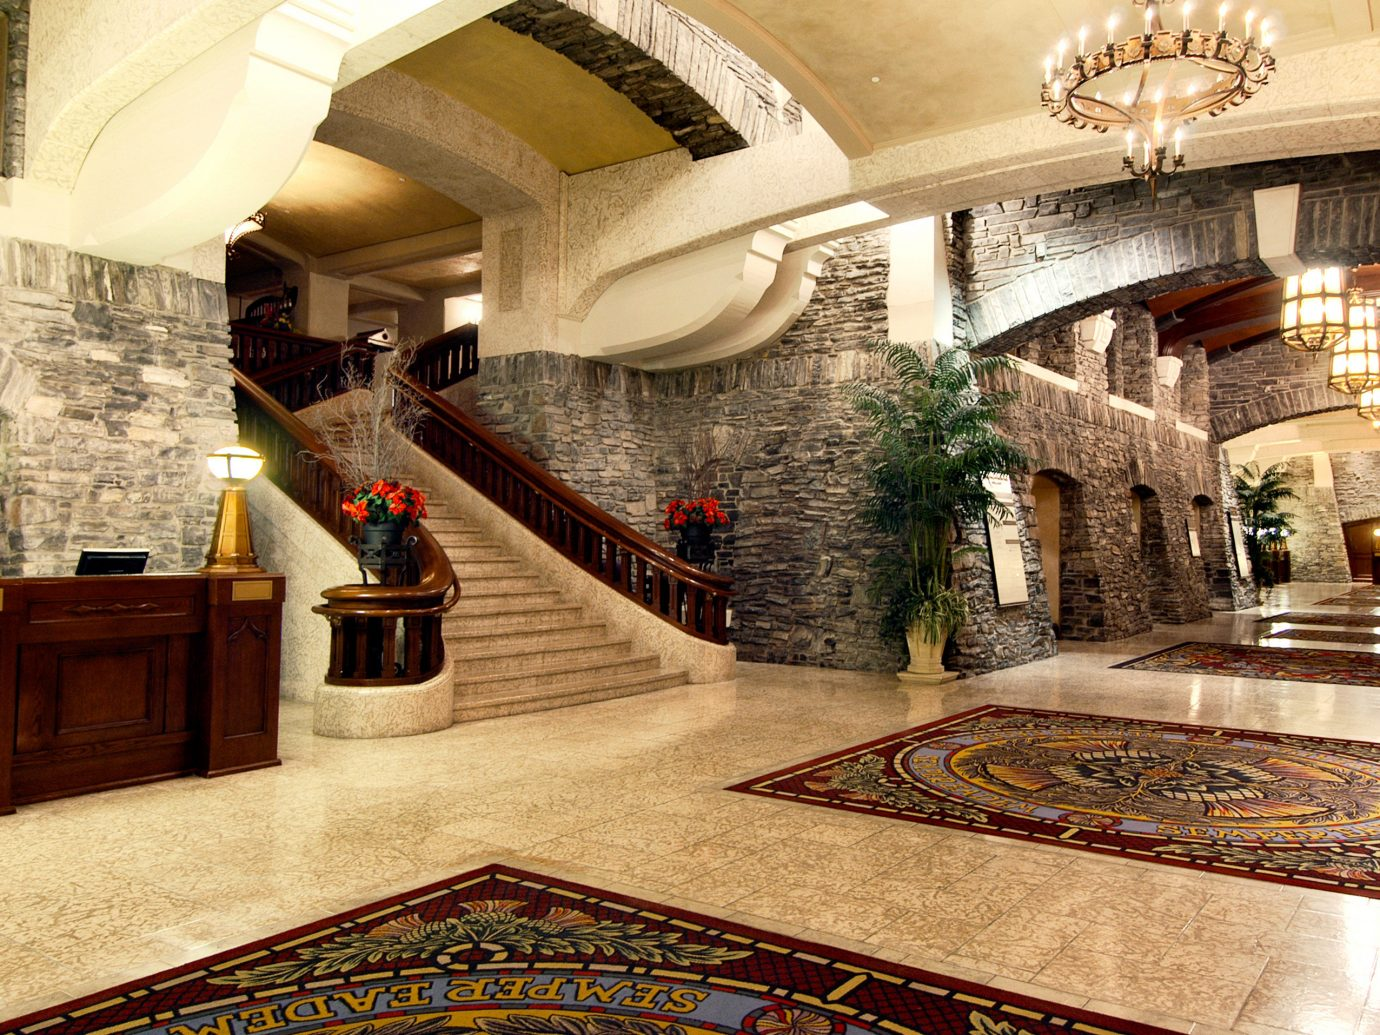 Lobby at Fairmont Banff Springs Hotel